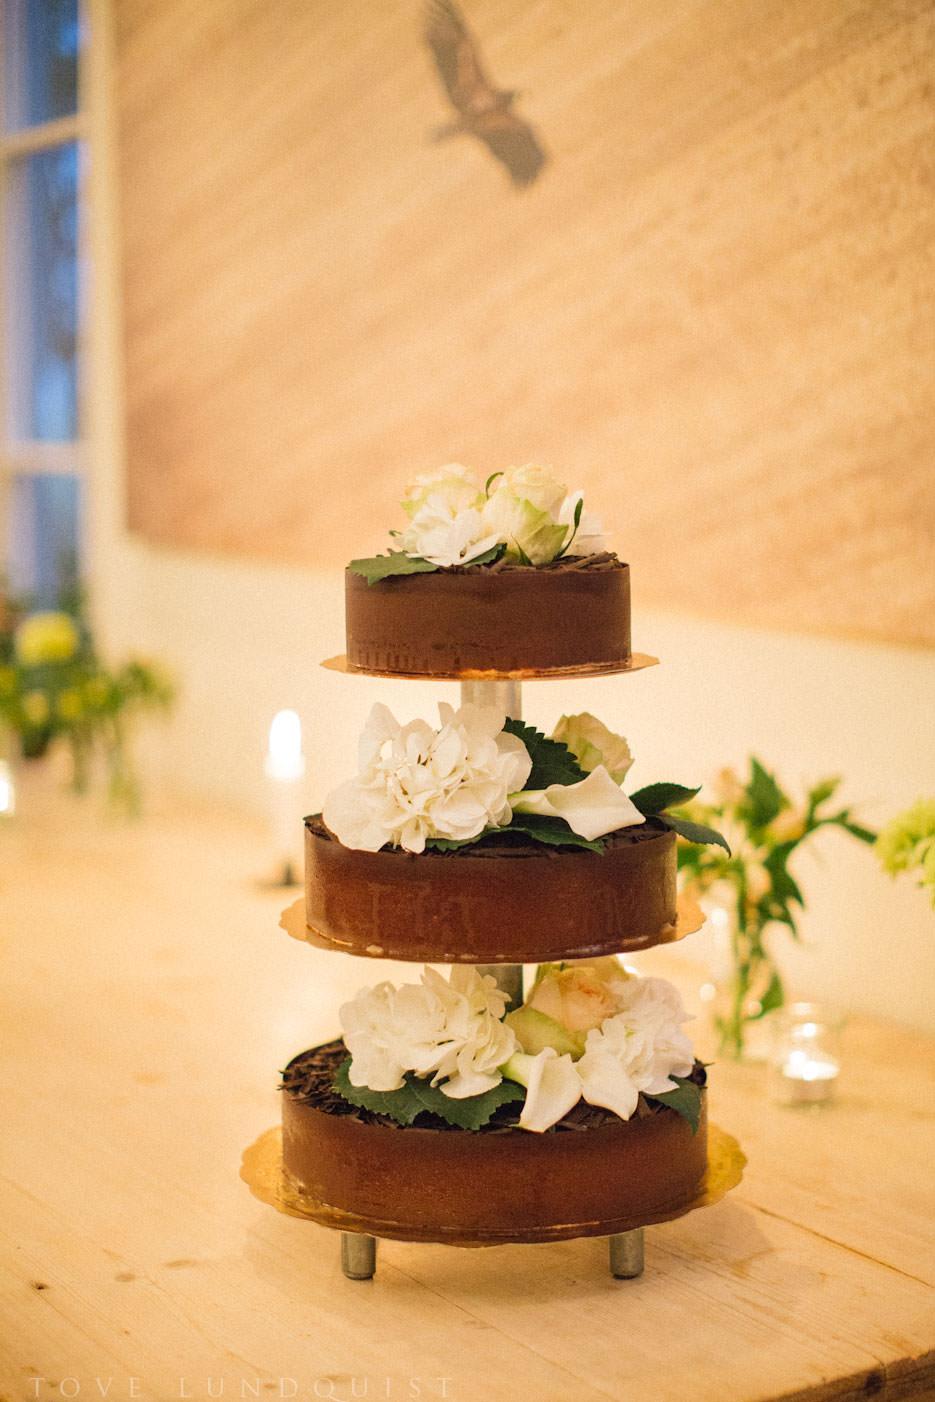 Tårta från Olof Viktors, Skåne. Foto: Tove Lundquist, verksam bröllopsfotograf Skåne.